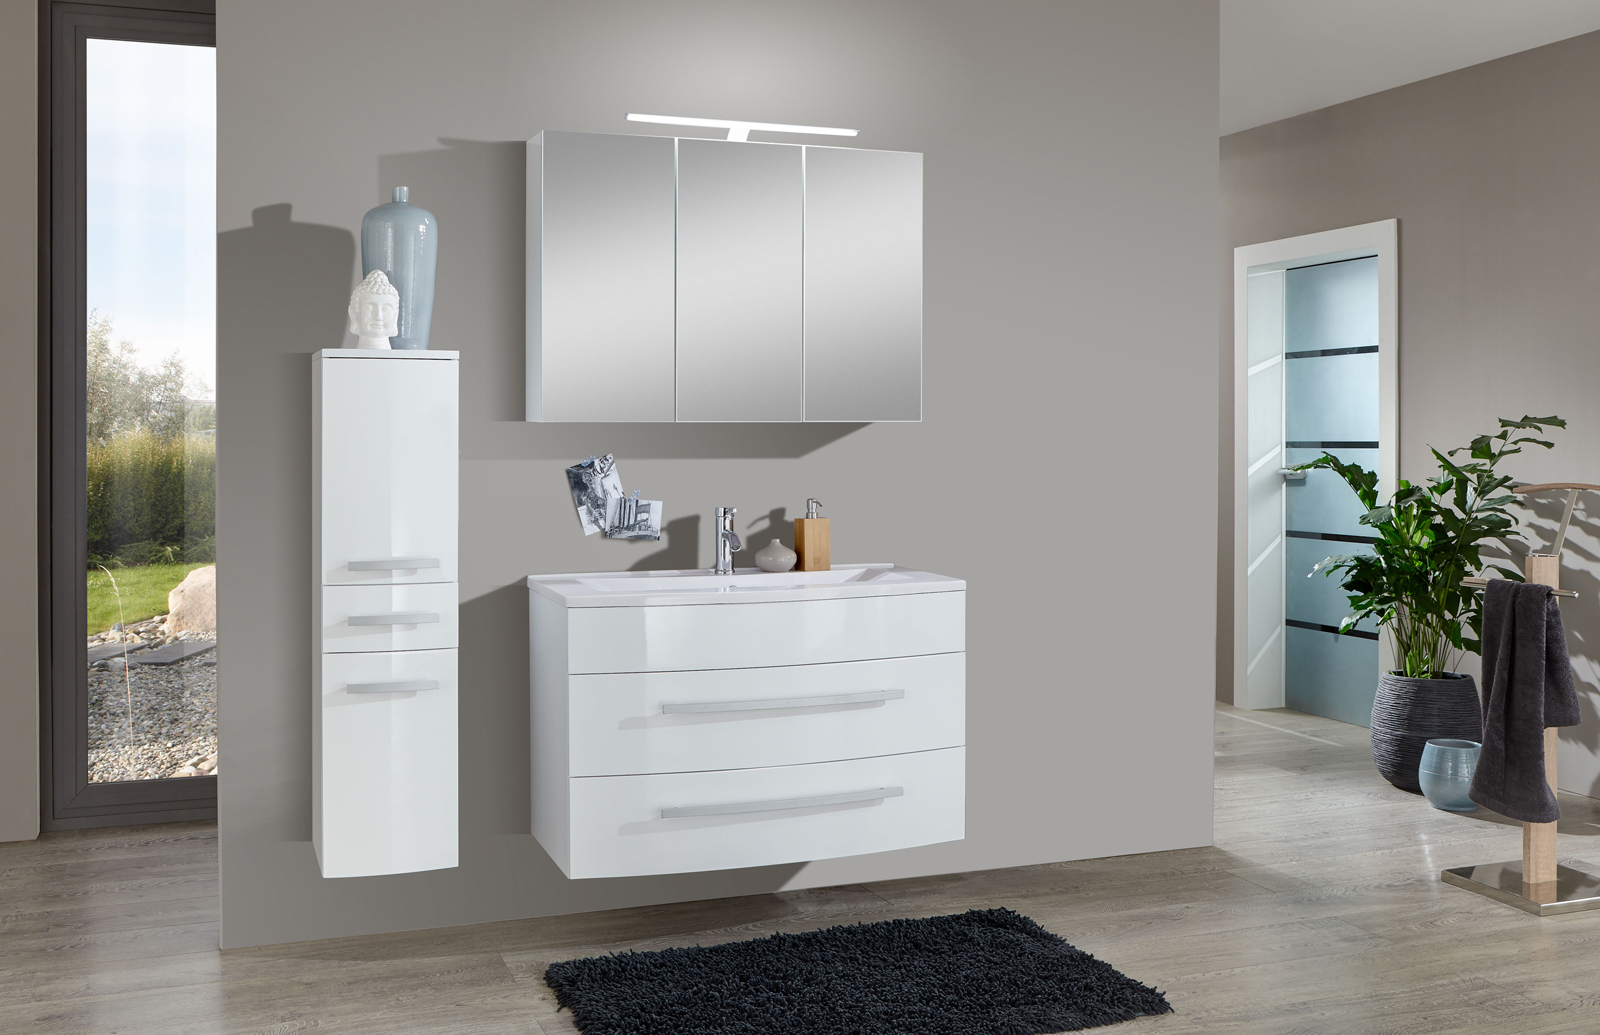 sam 3tlg badezimmer set hochglanz wei 100cm genf. Black Bedroom Furniture Sets. Home Design Ideas